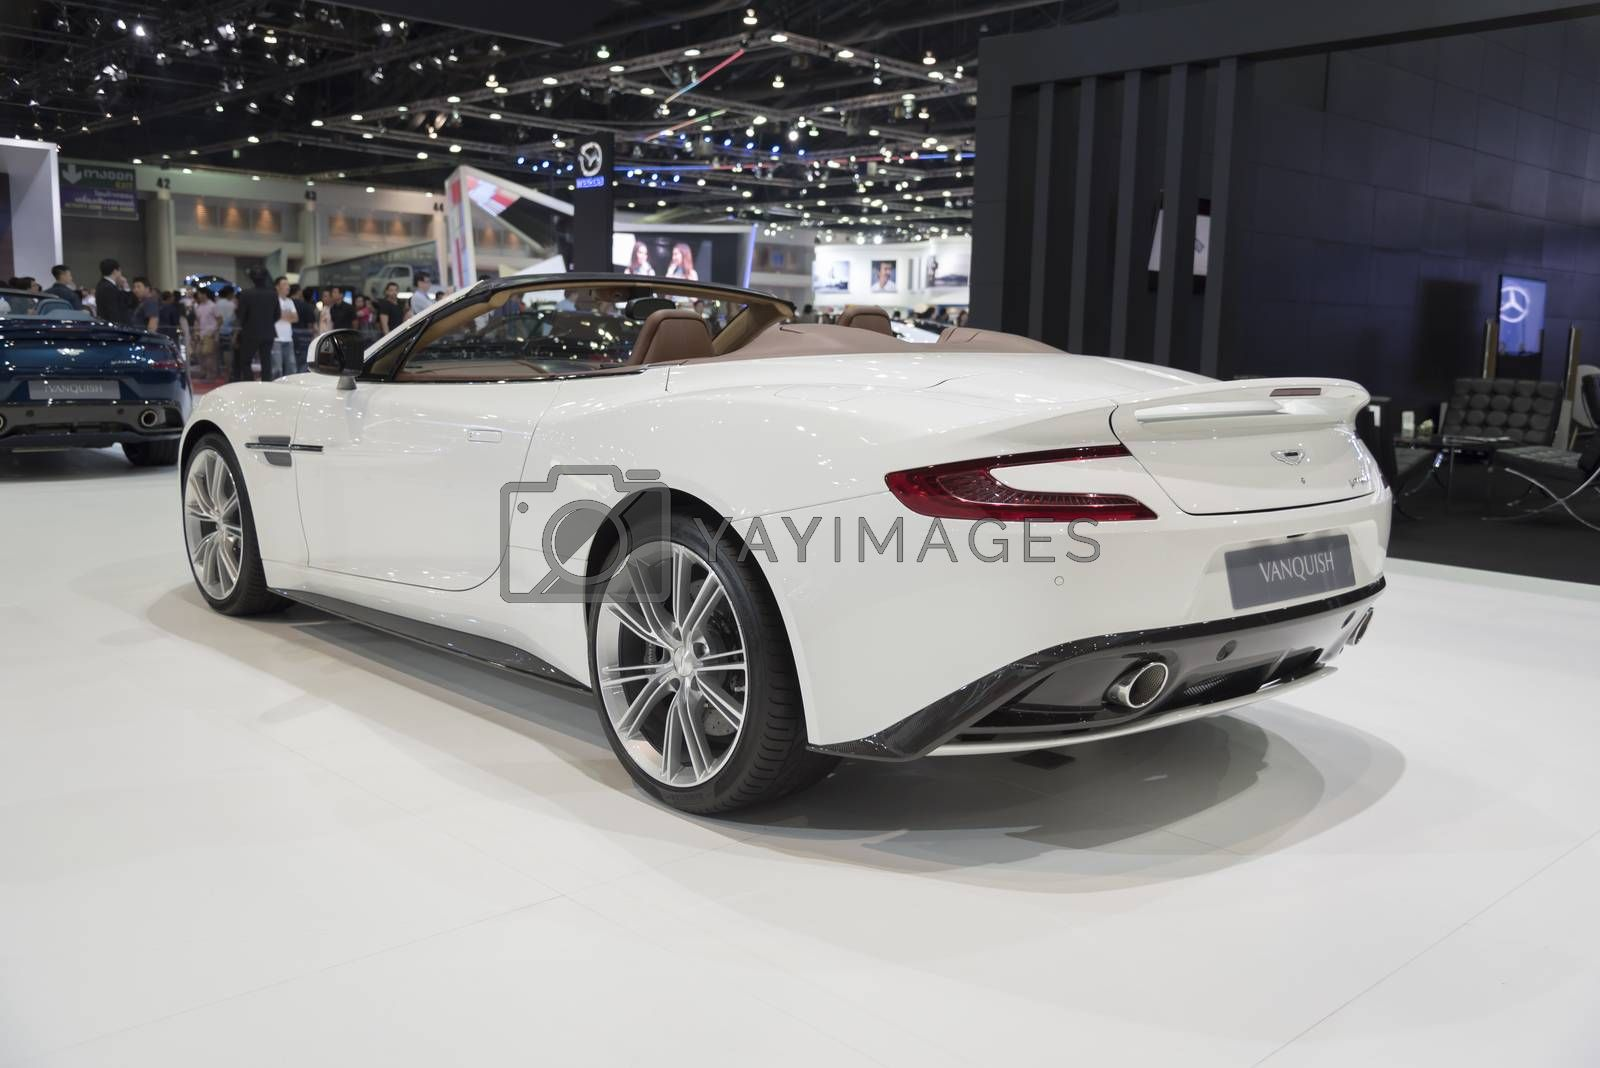 BANGKOK,THAILAND - APRIL 4 : Aston Martin vanquish show on April 4,2015 at the 36th Bangkok international motor show in Thailand.